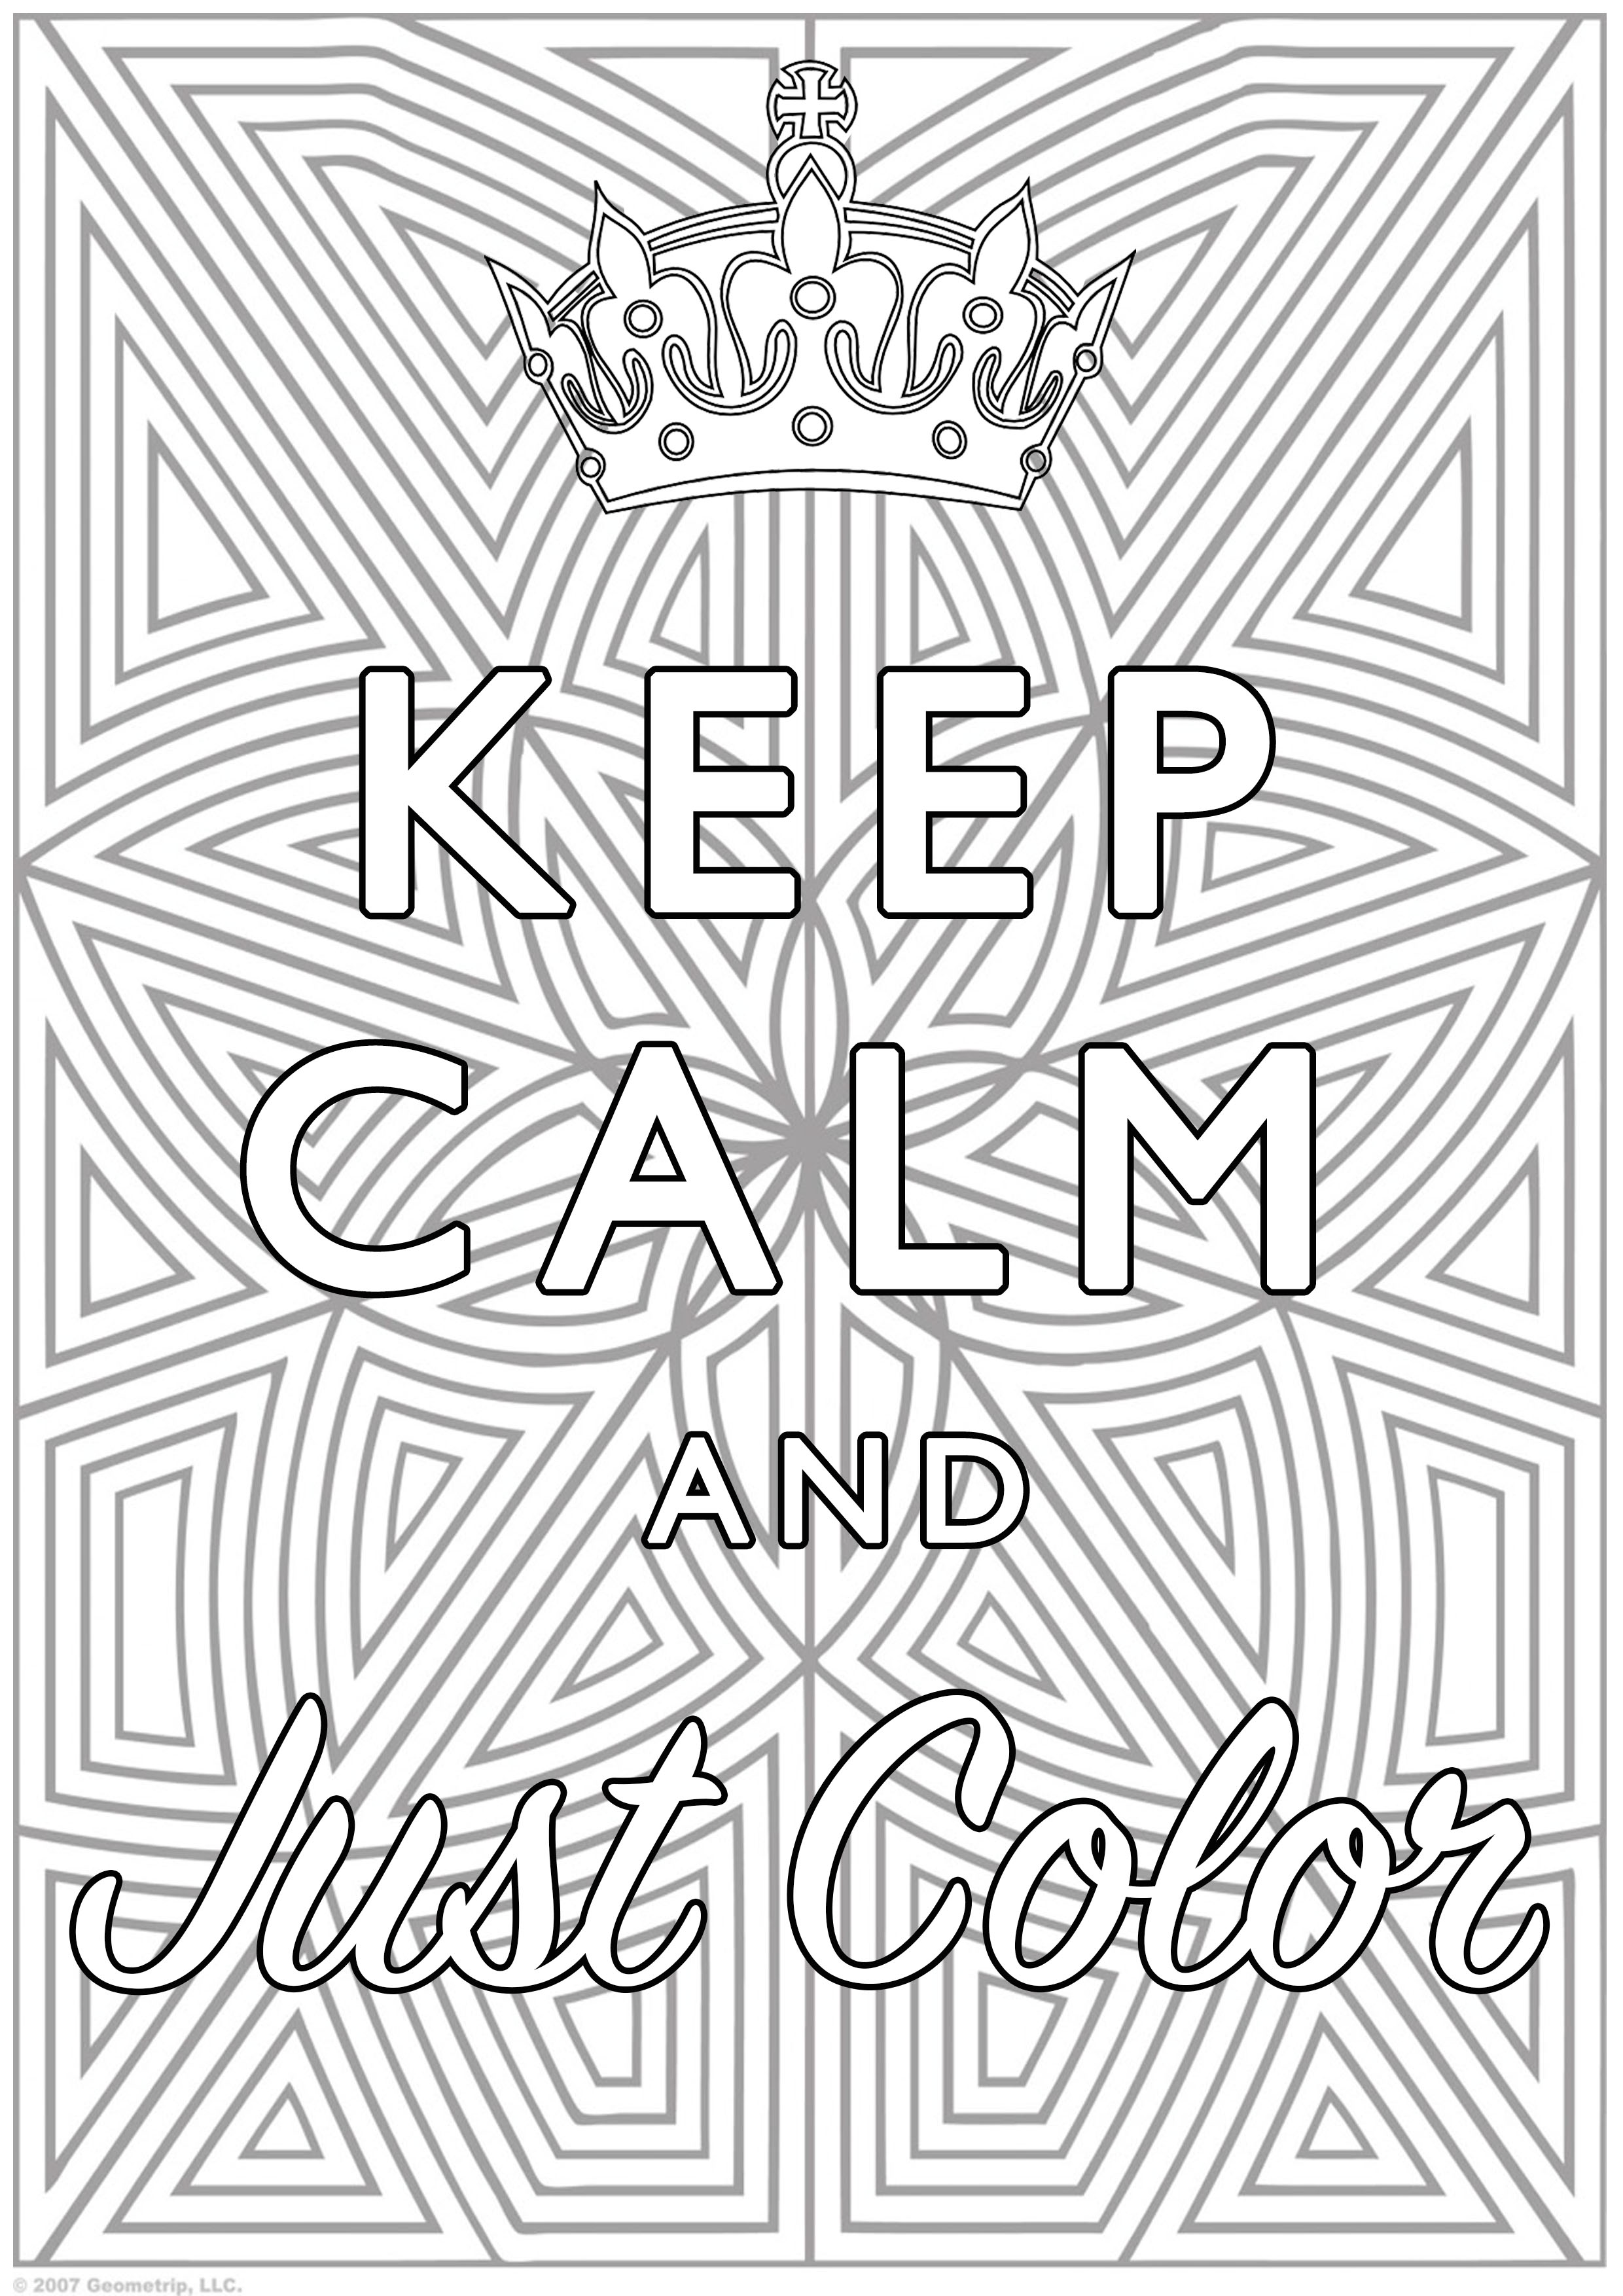 Disegni da Colorare per Adulti : Keep Calm - 10